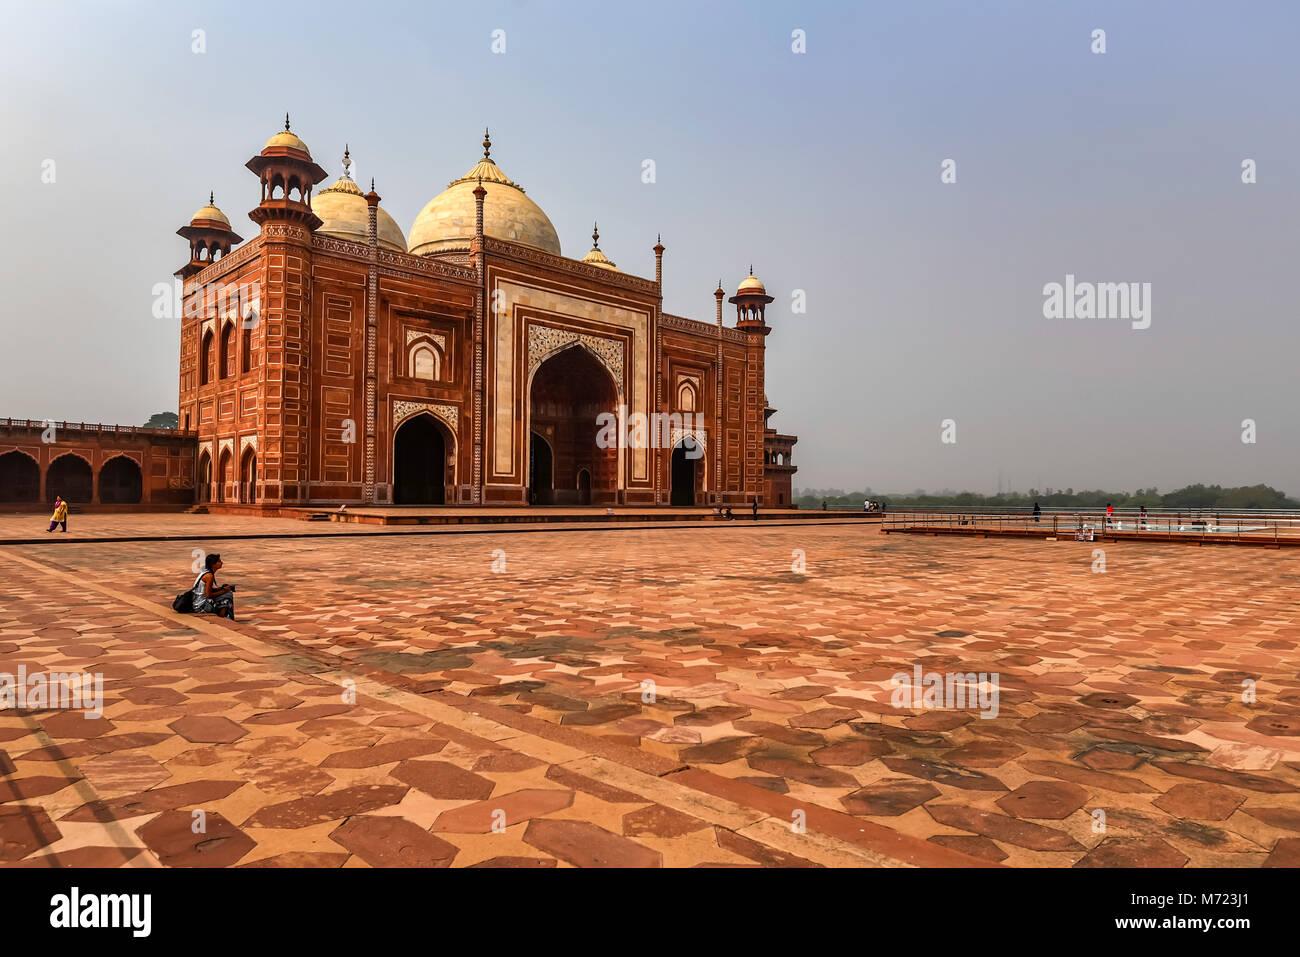 AGRA, Indien - 8. NOVEMBER 2017: Blick auf Moschee in Taj-Mahal Stockbild